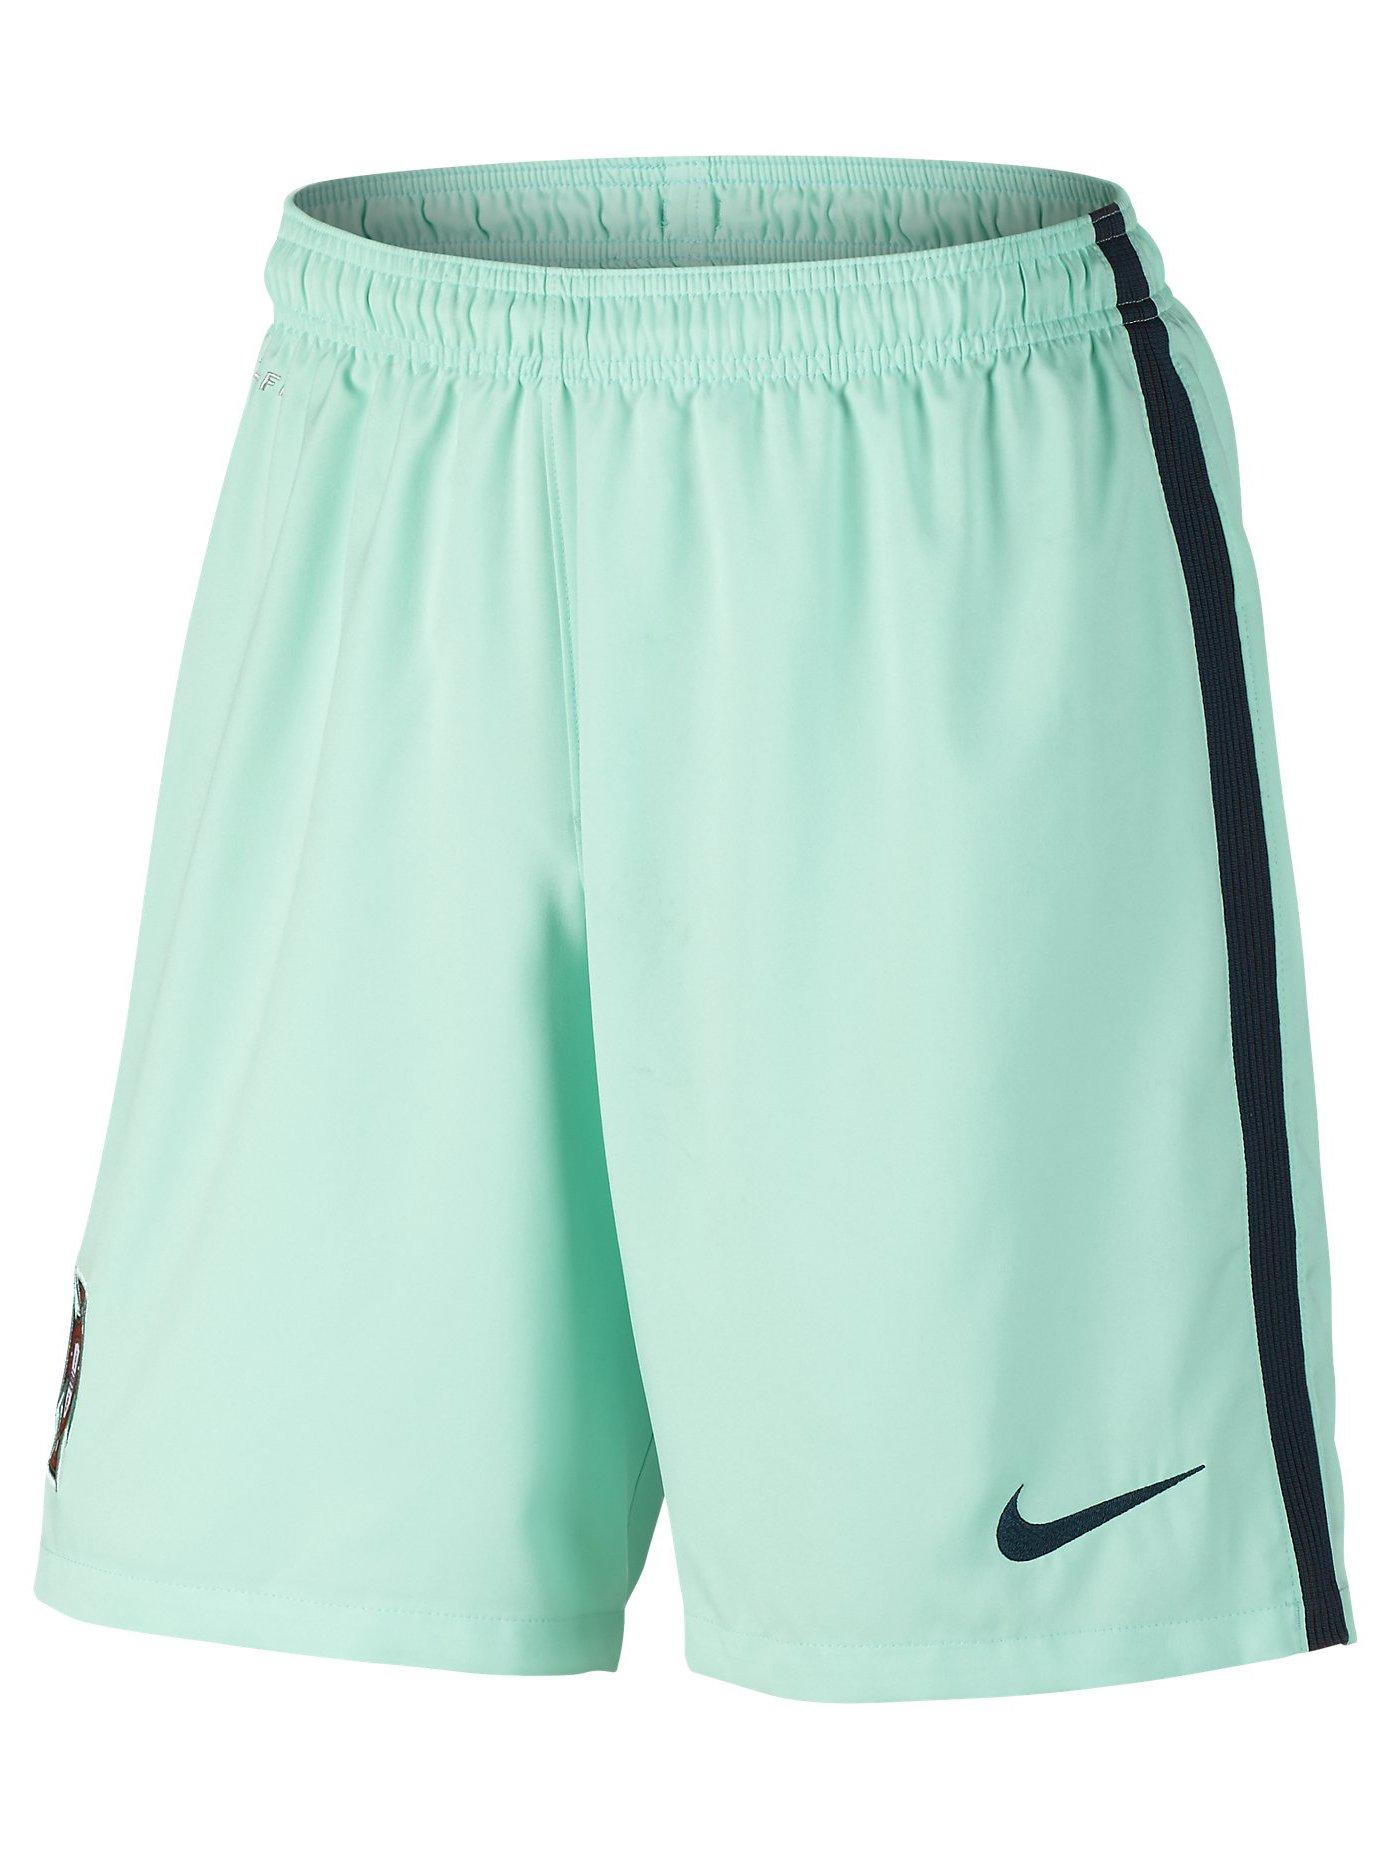 Šortky Nike FPF M H/A STADIUM SHORT